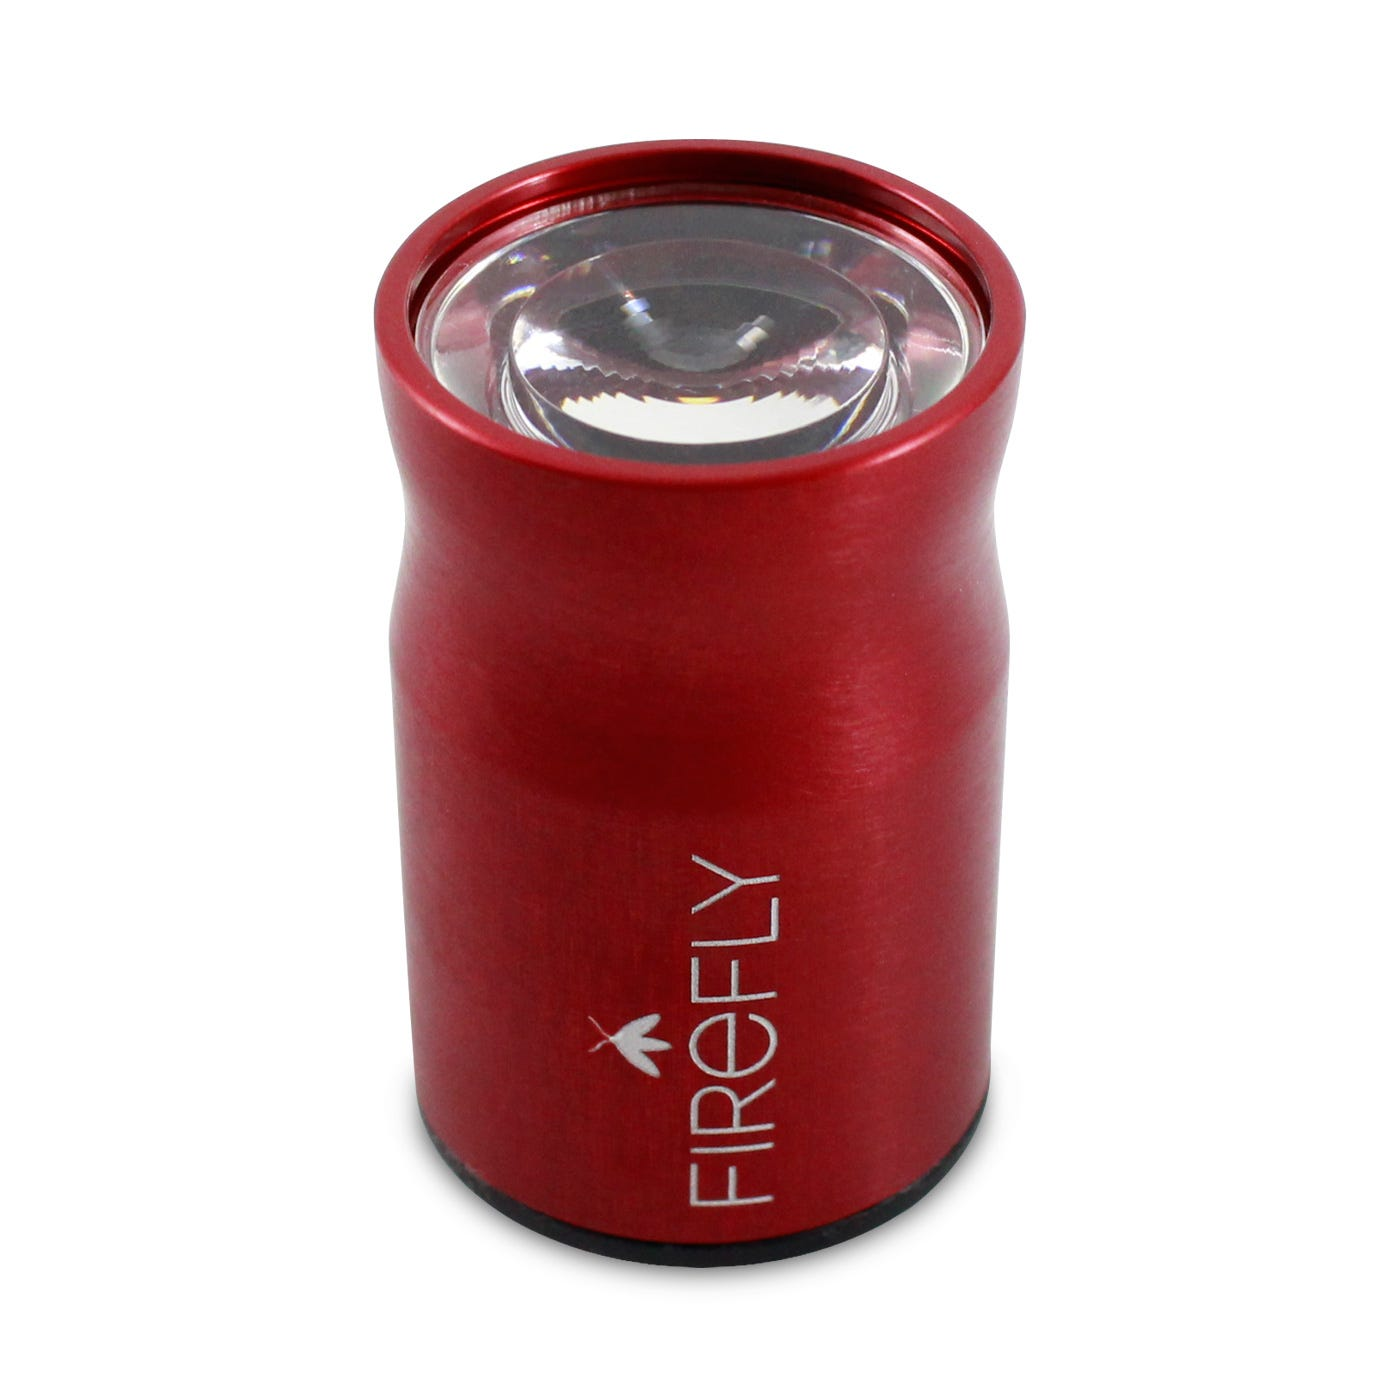 Dental Headlight - Firefly Replacement Barrel Red